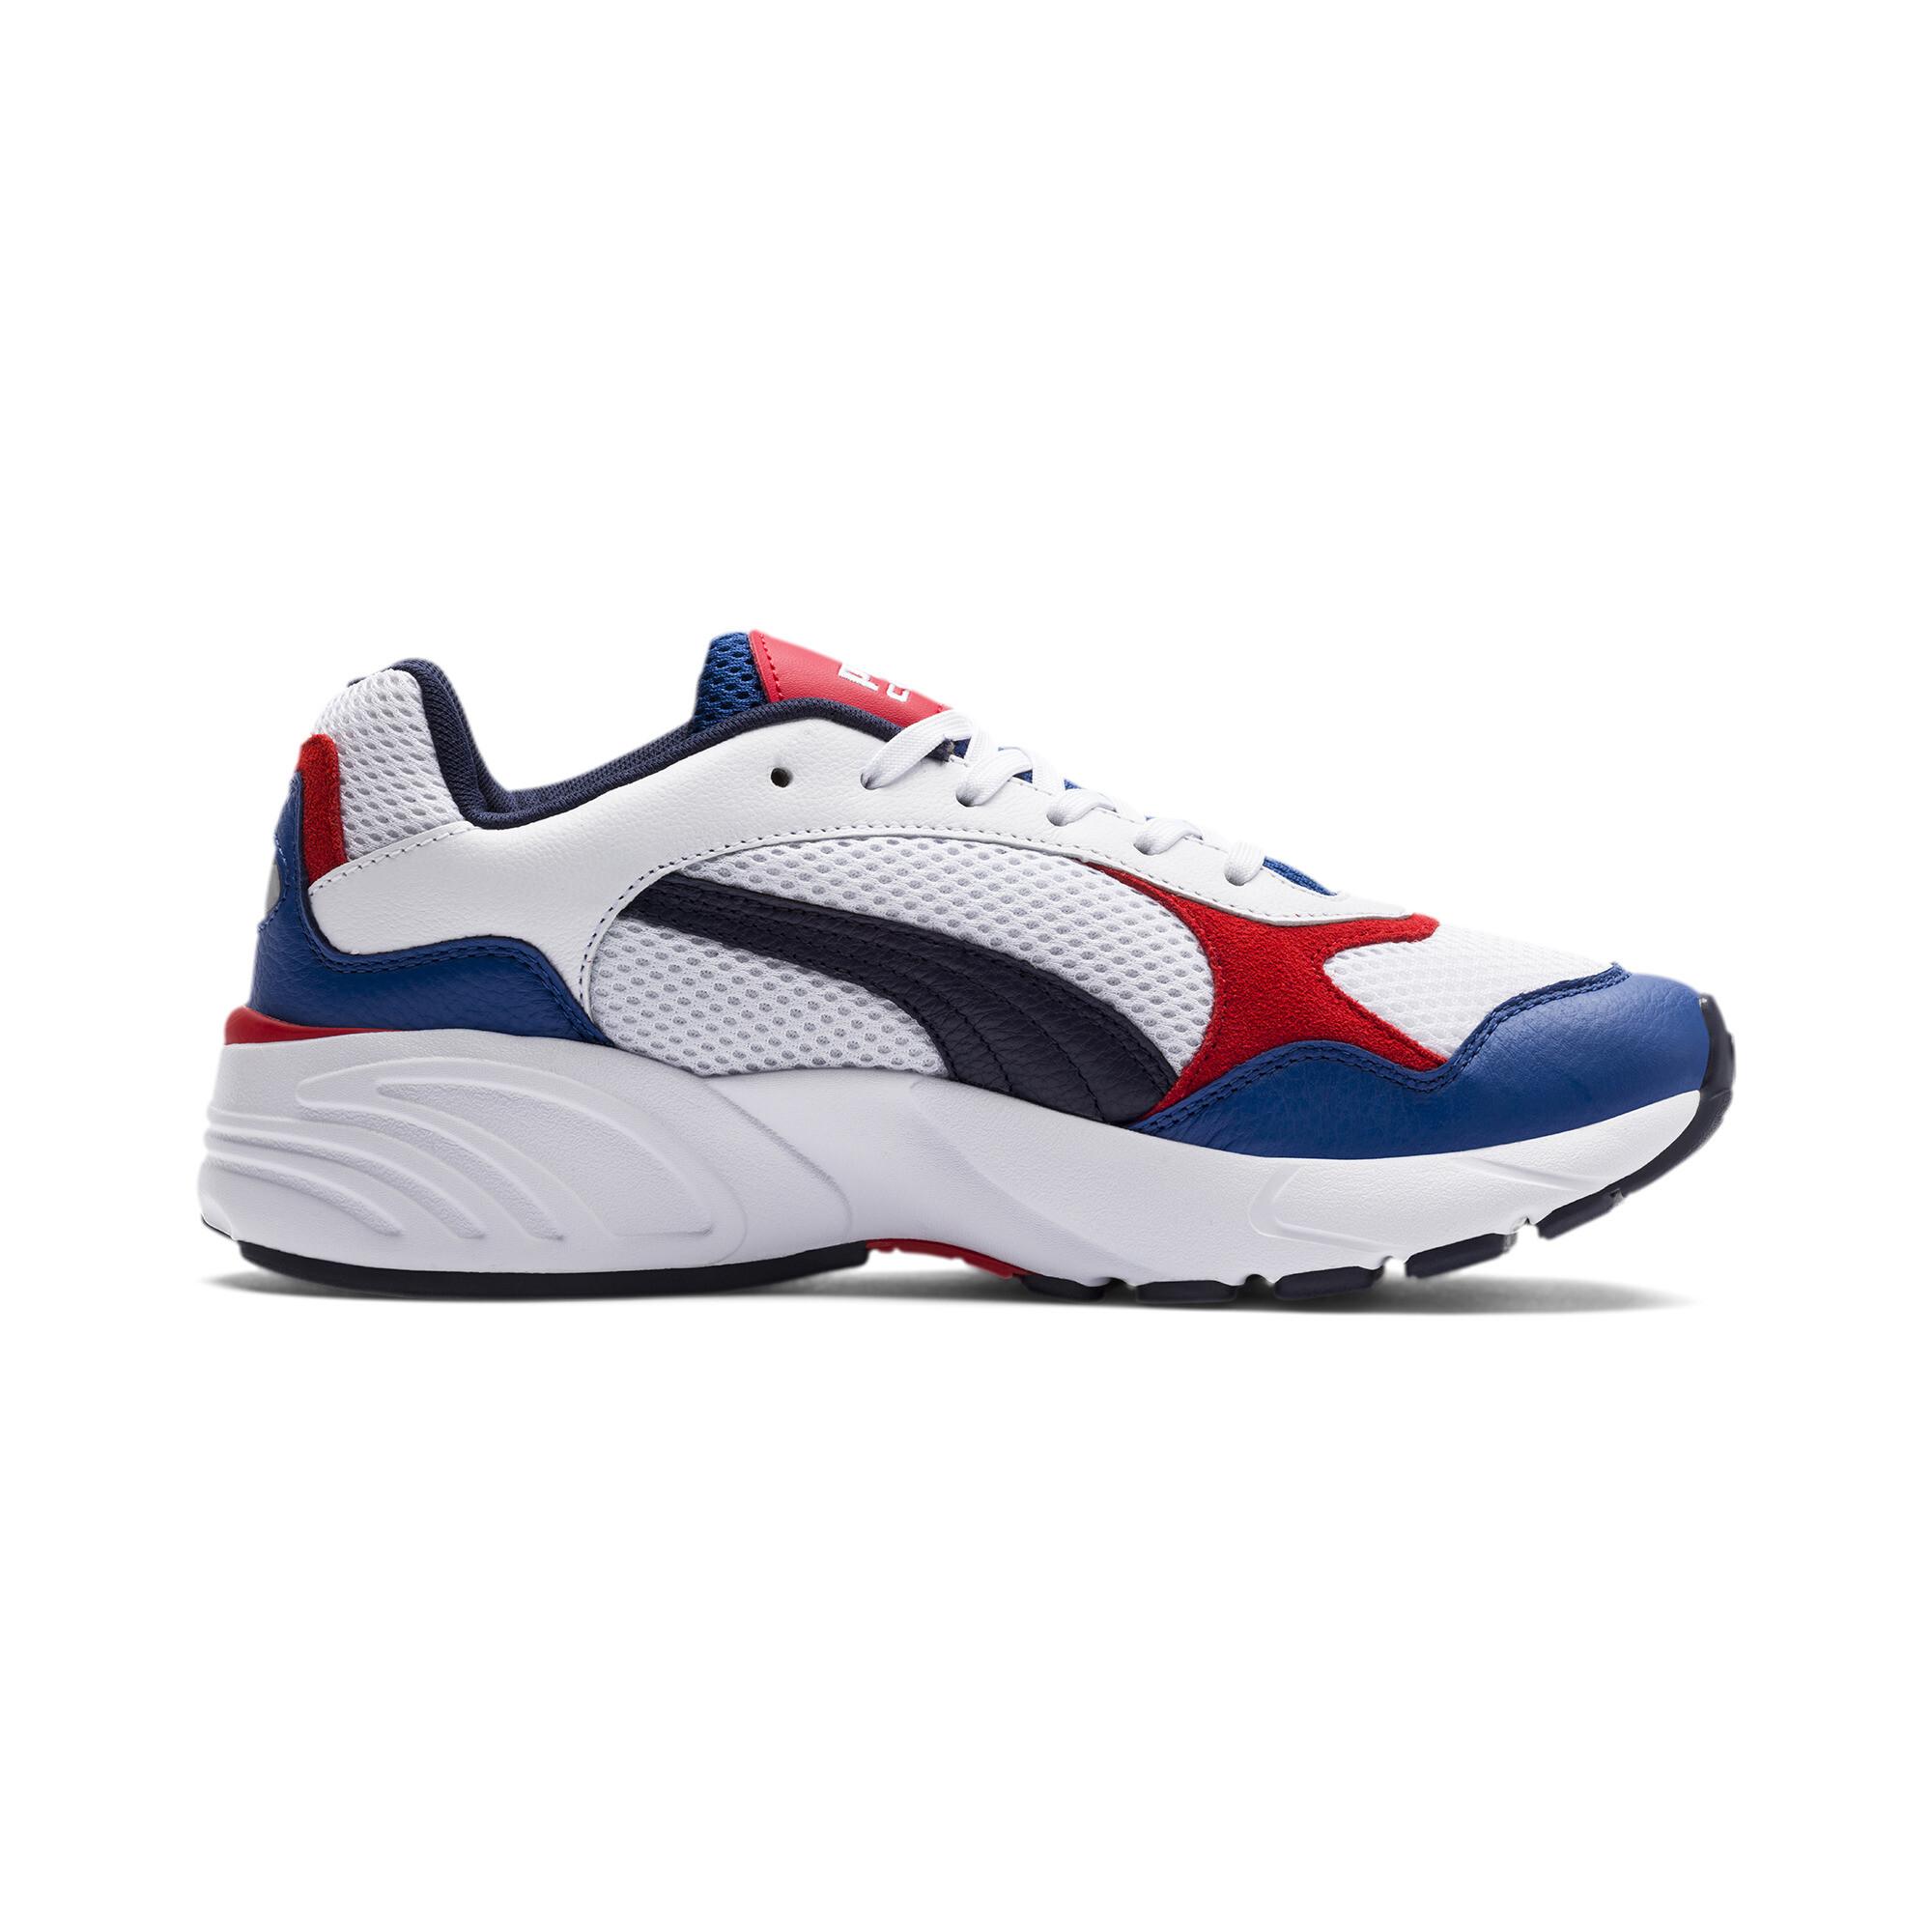 Indexbild 12 - PUMA CELL Viper Leather Sneaker Unisex Schuhe Sport Classics Neu